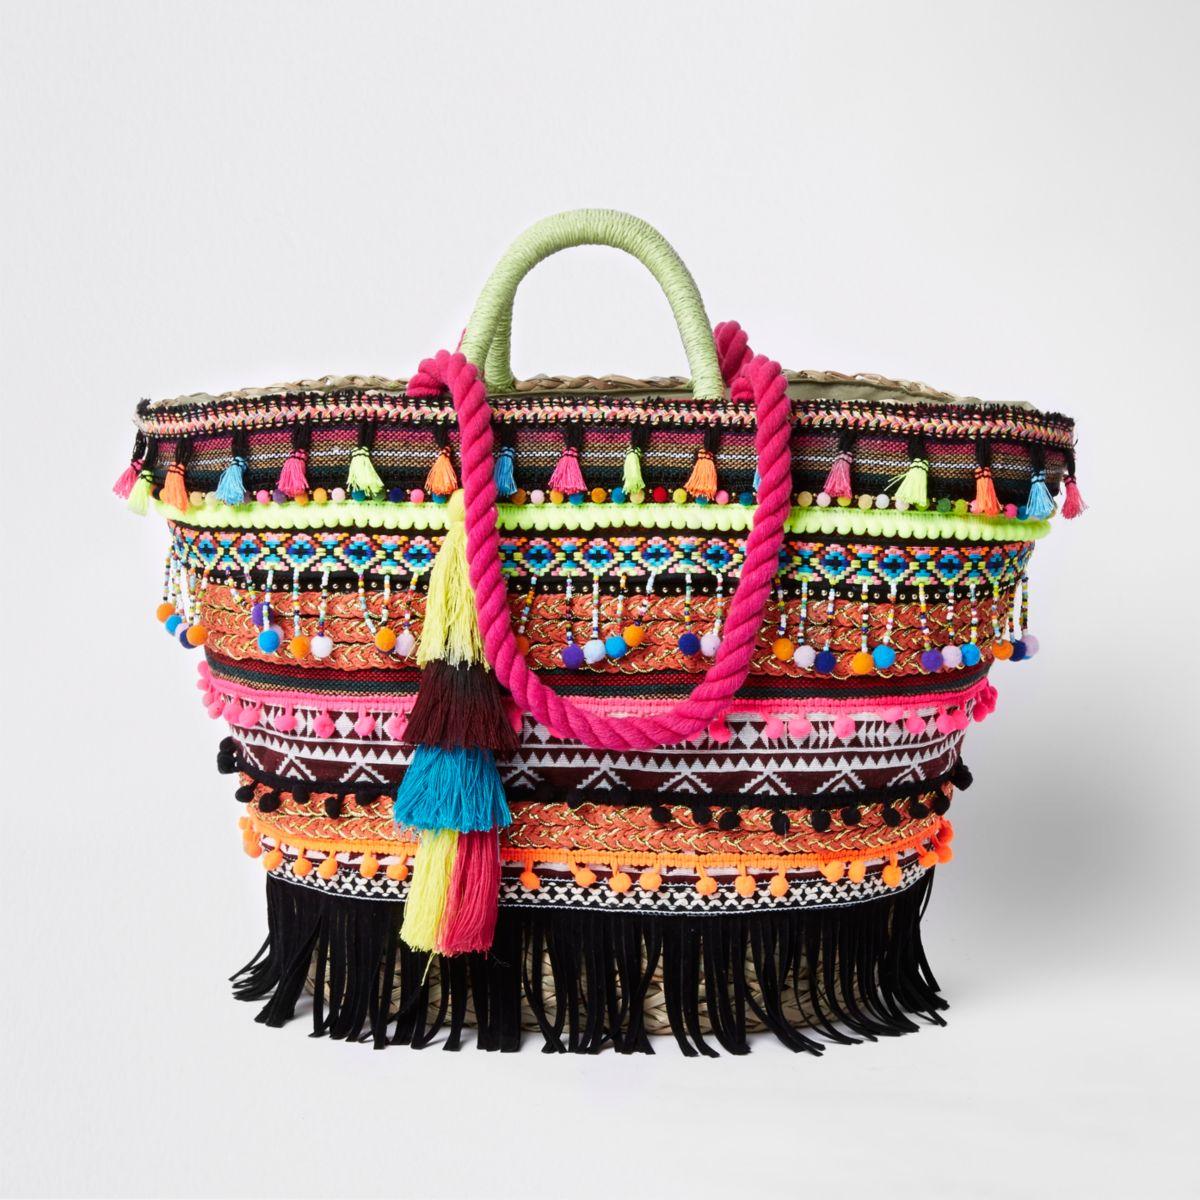 Pink tassel woven basket shopper bag